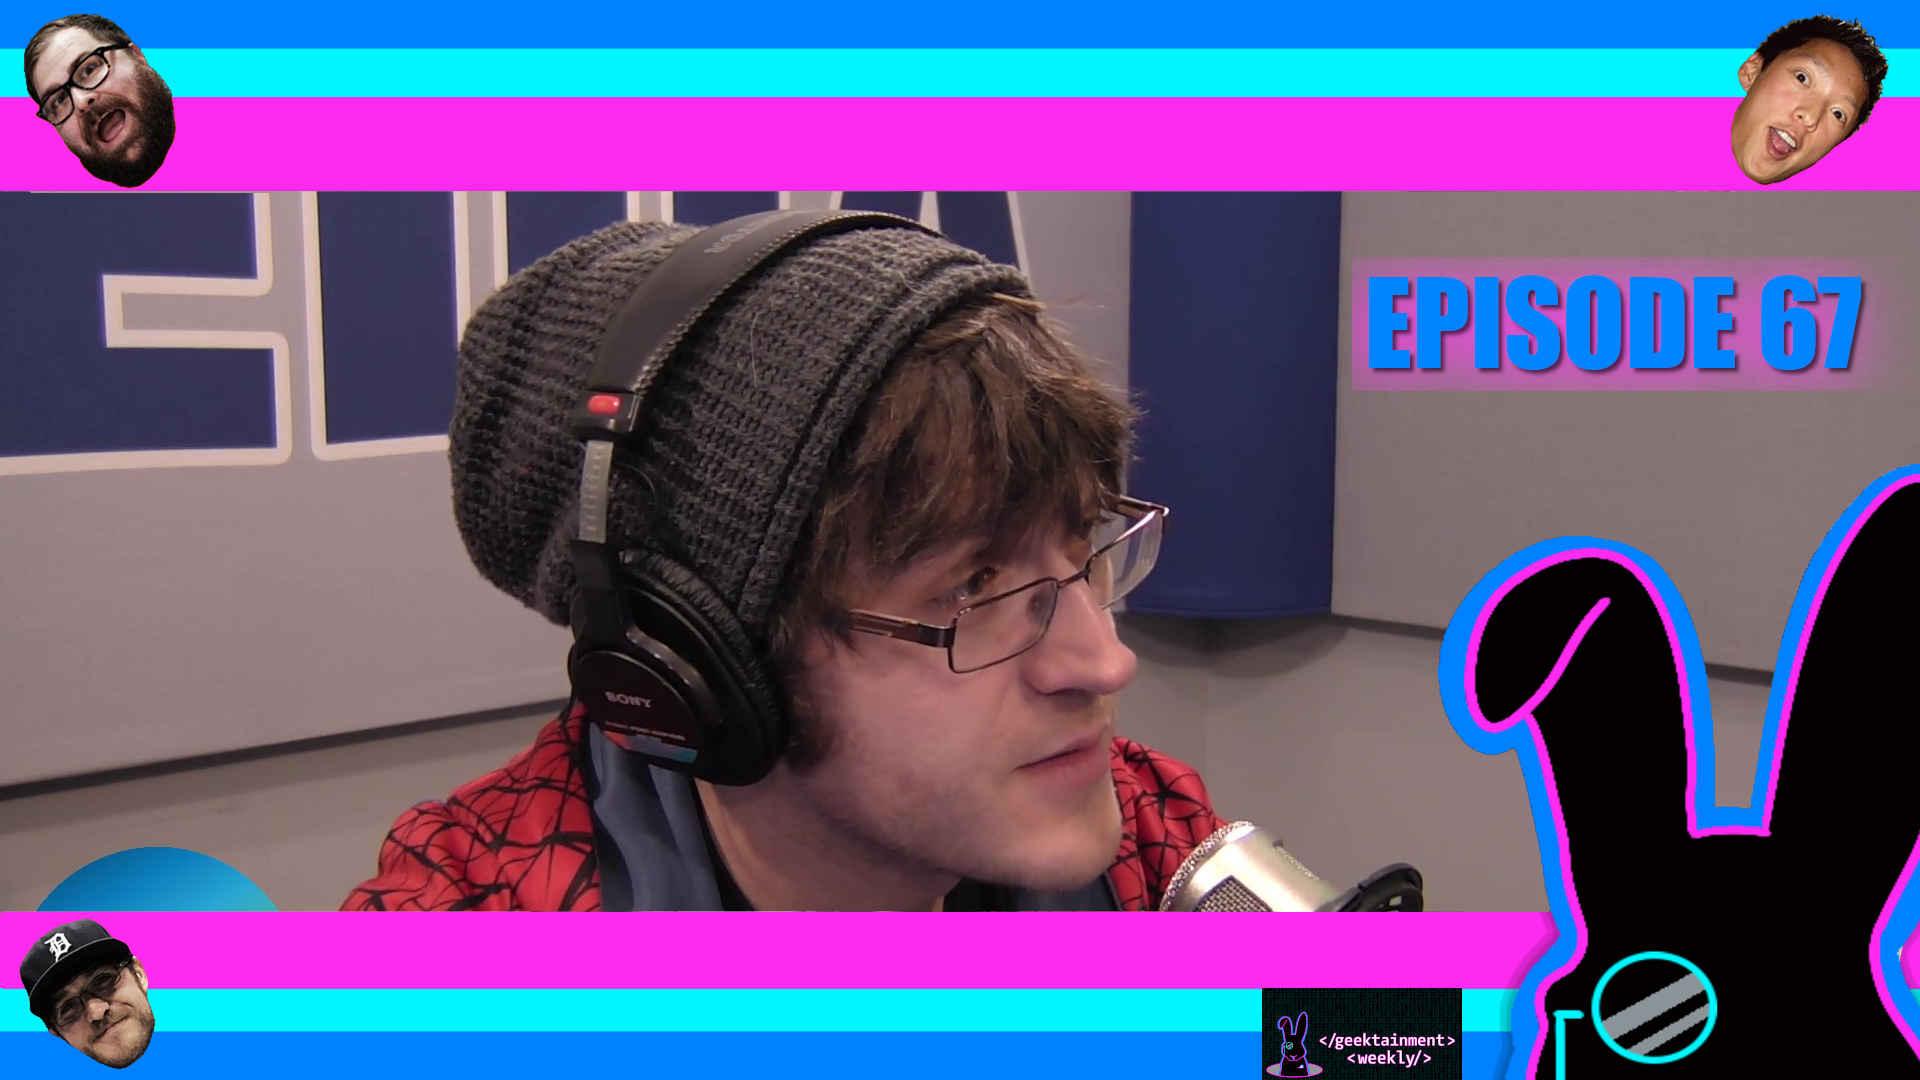 Geektainment Weekly - Episode 67